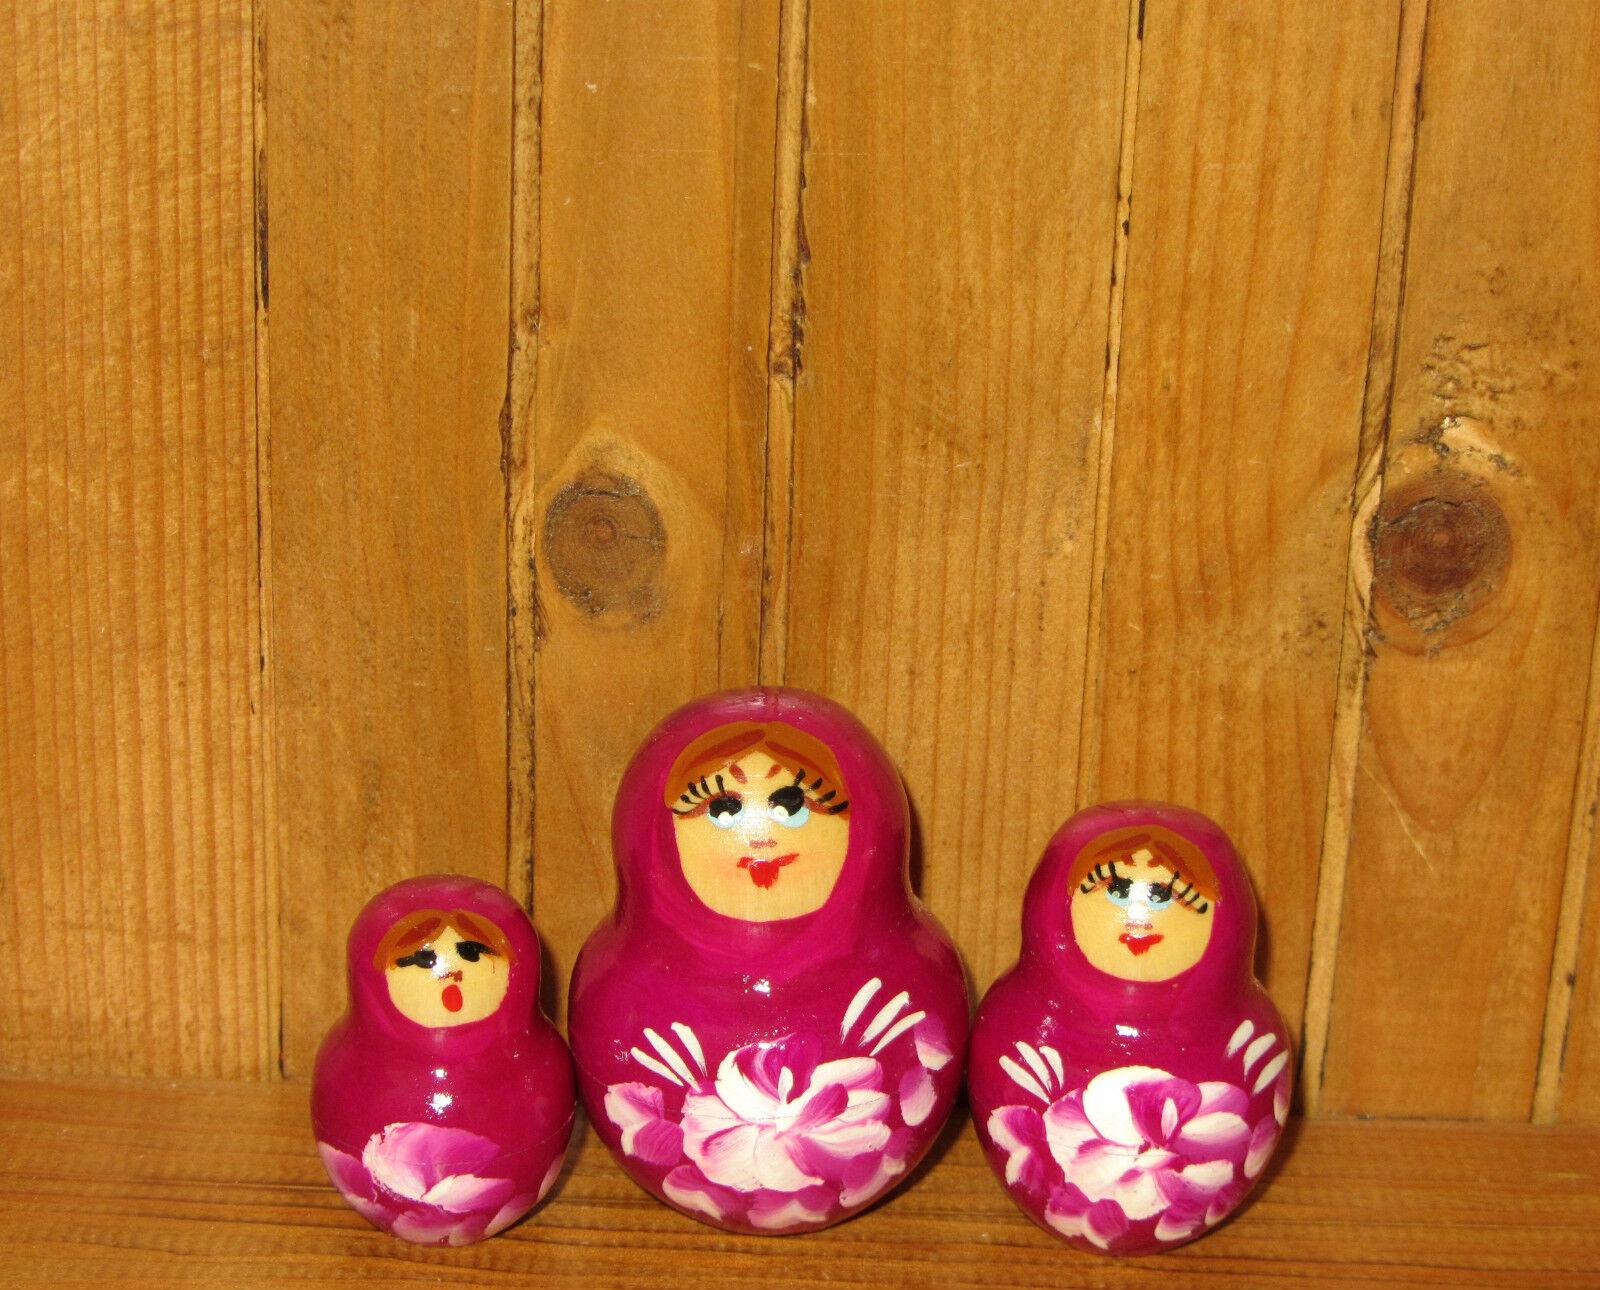 Verschachtelte Russische Puppe Matryoshka Matryoshka Matryoshka Babuschka 10 Lila Vögel Nikitina Kunst c0bc0d